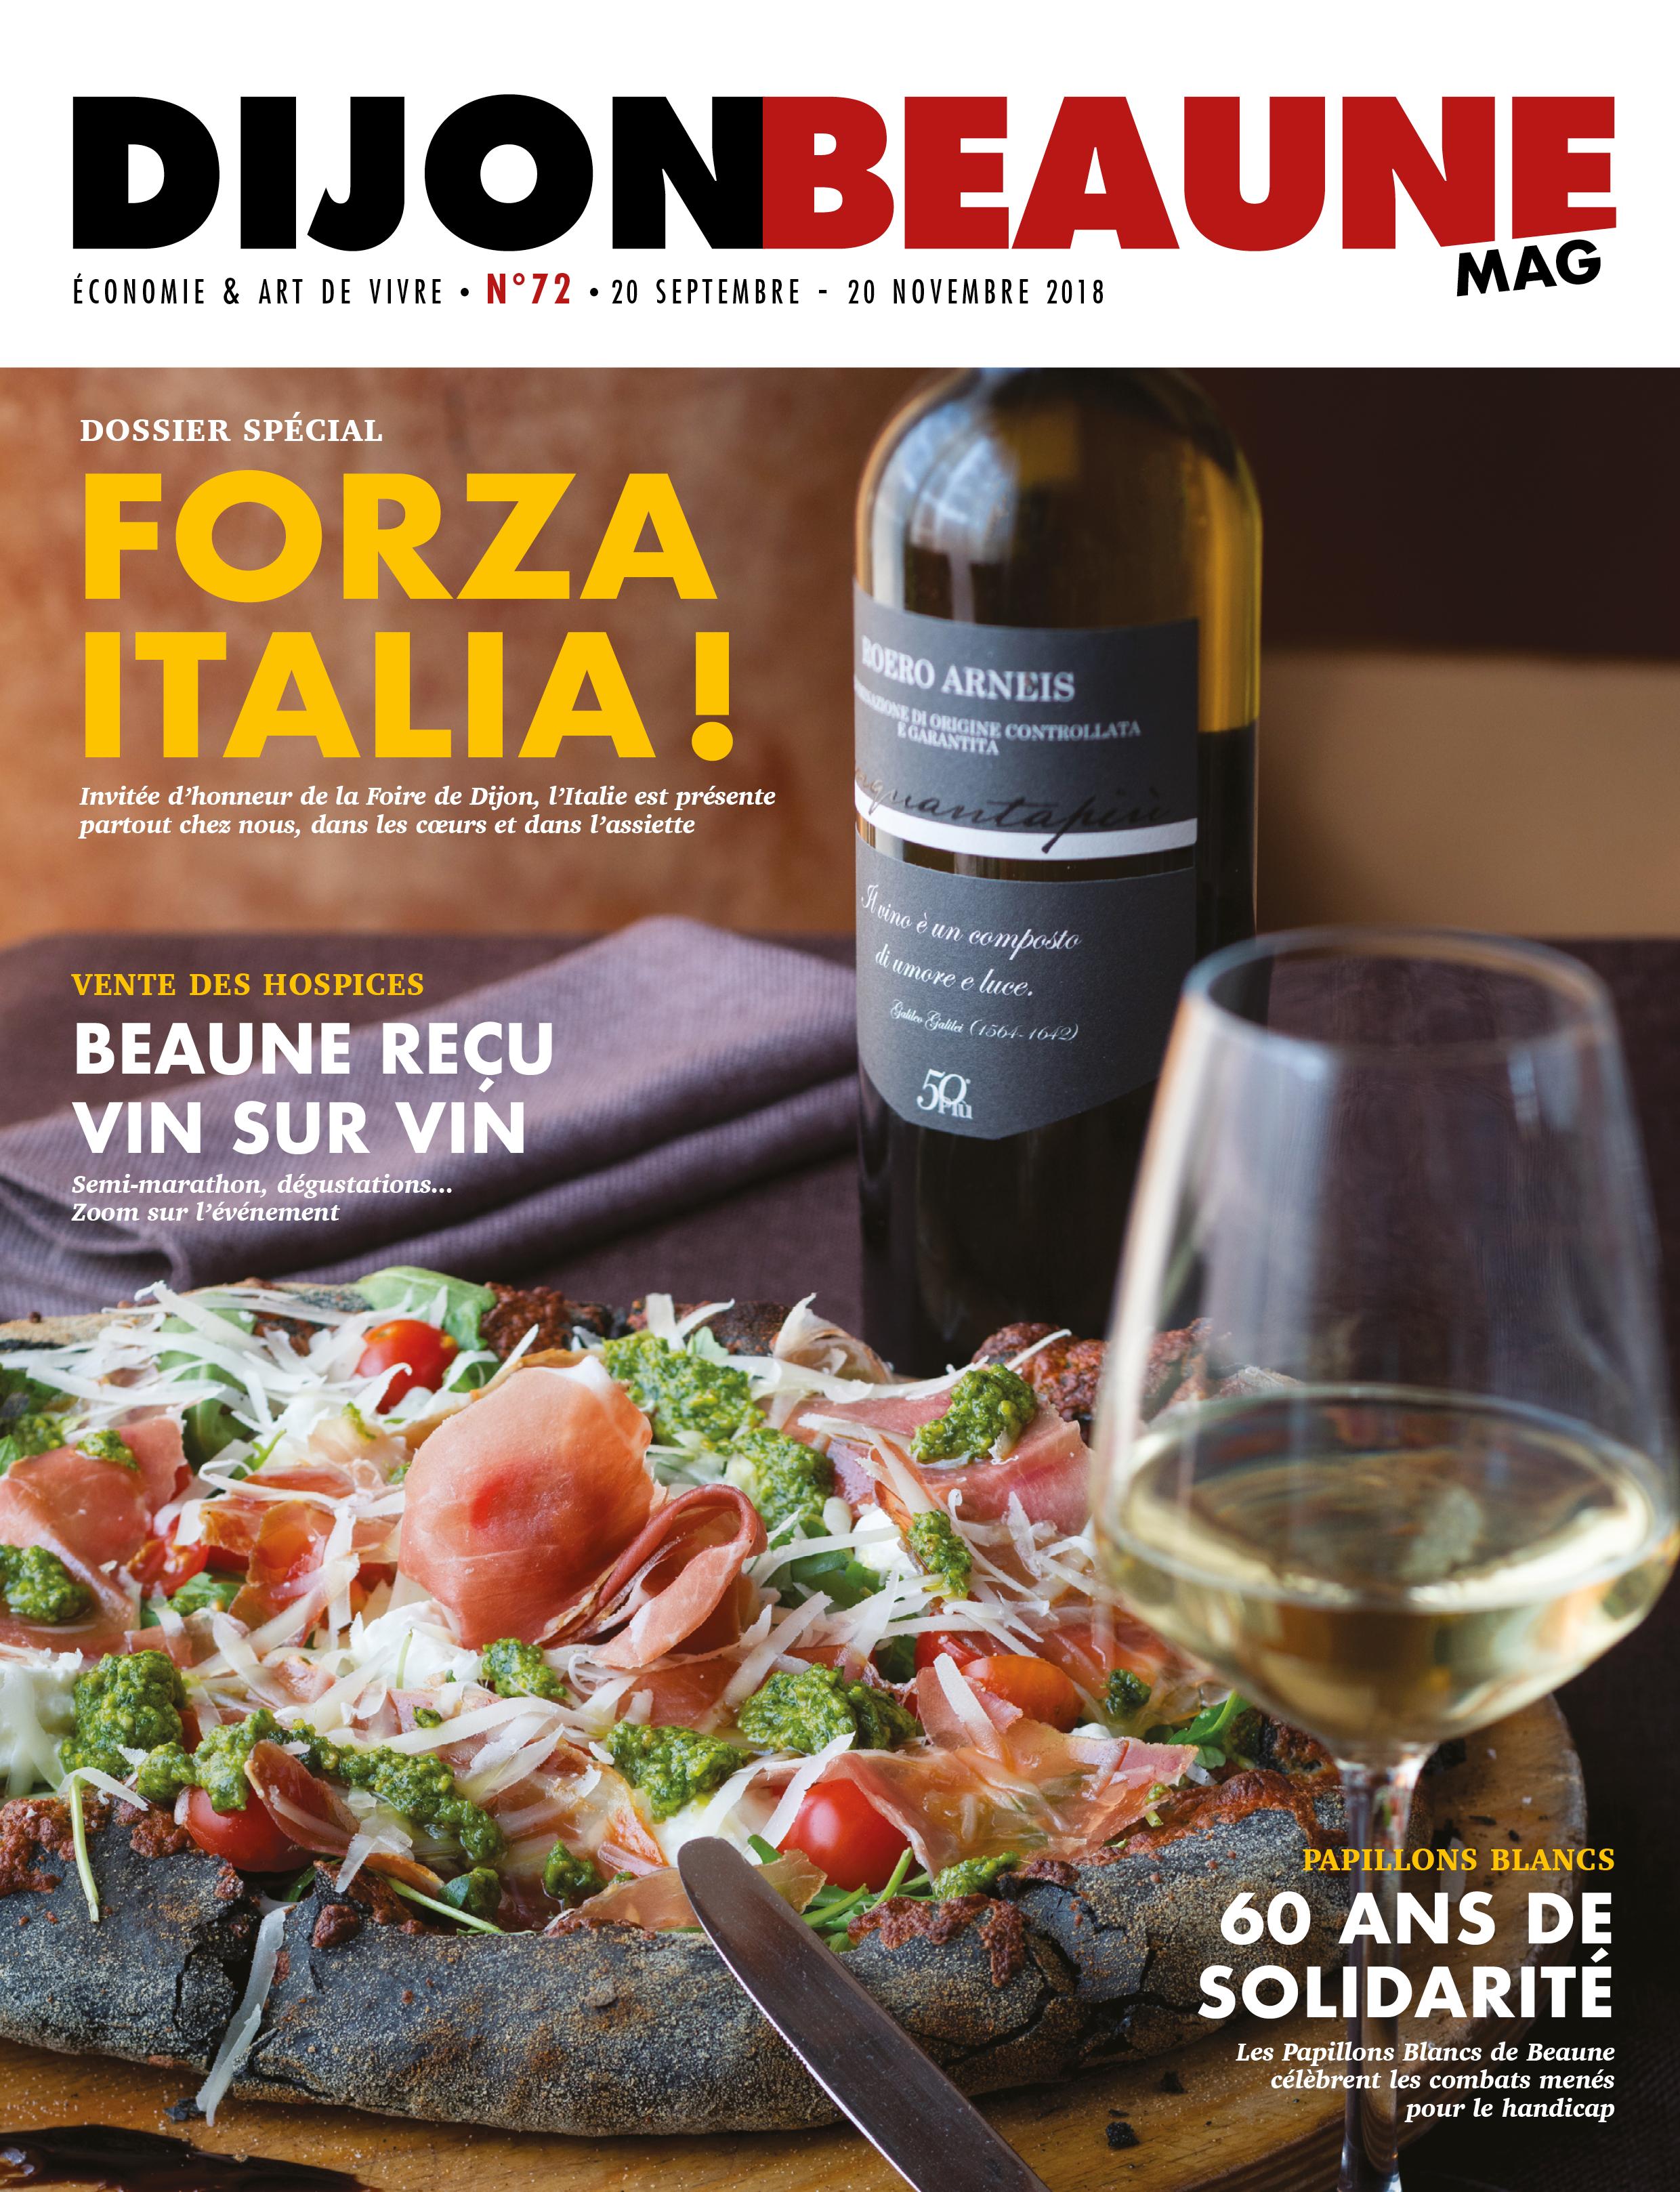 Dijon-Beaune Mag #72 célèbre Dijon à l'italienne !